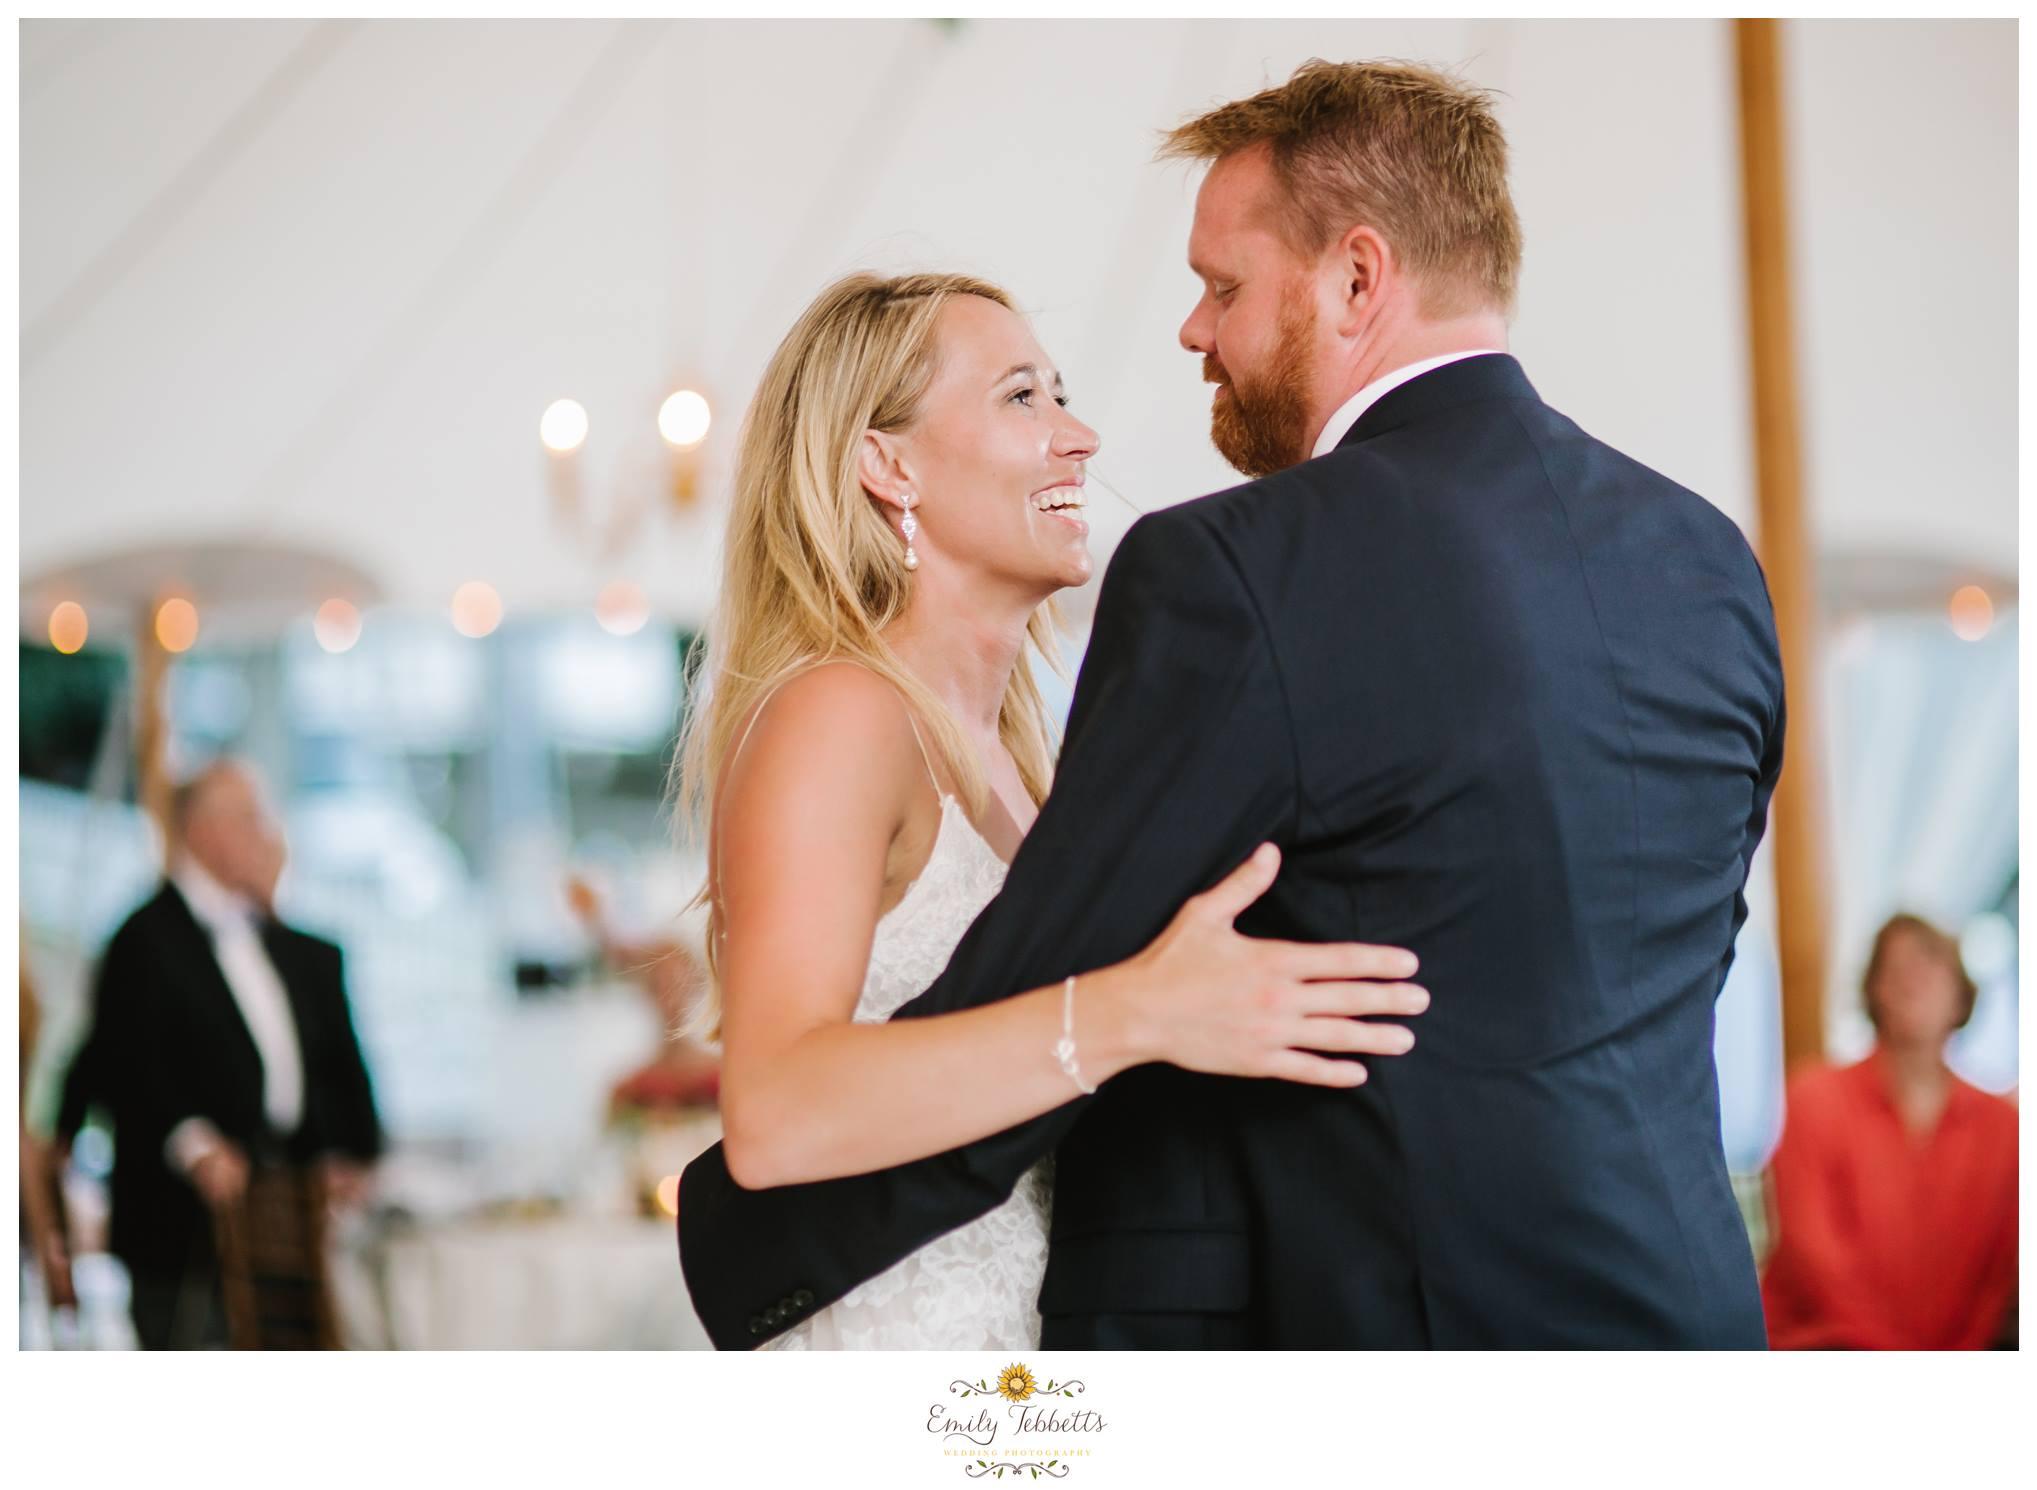 Emily Tebbetts Photography Wedding || Private Residence : Dauntless Club, Essex, CT 11.jpg